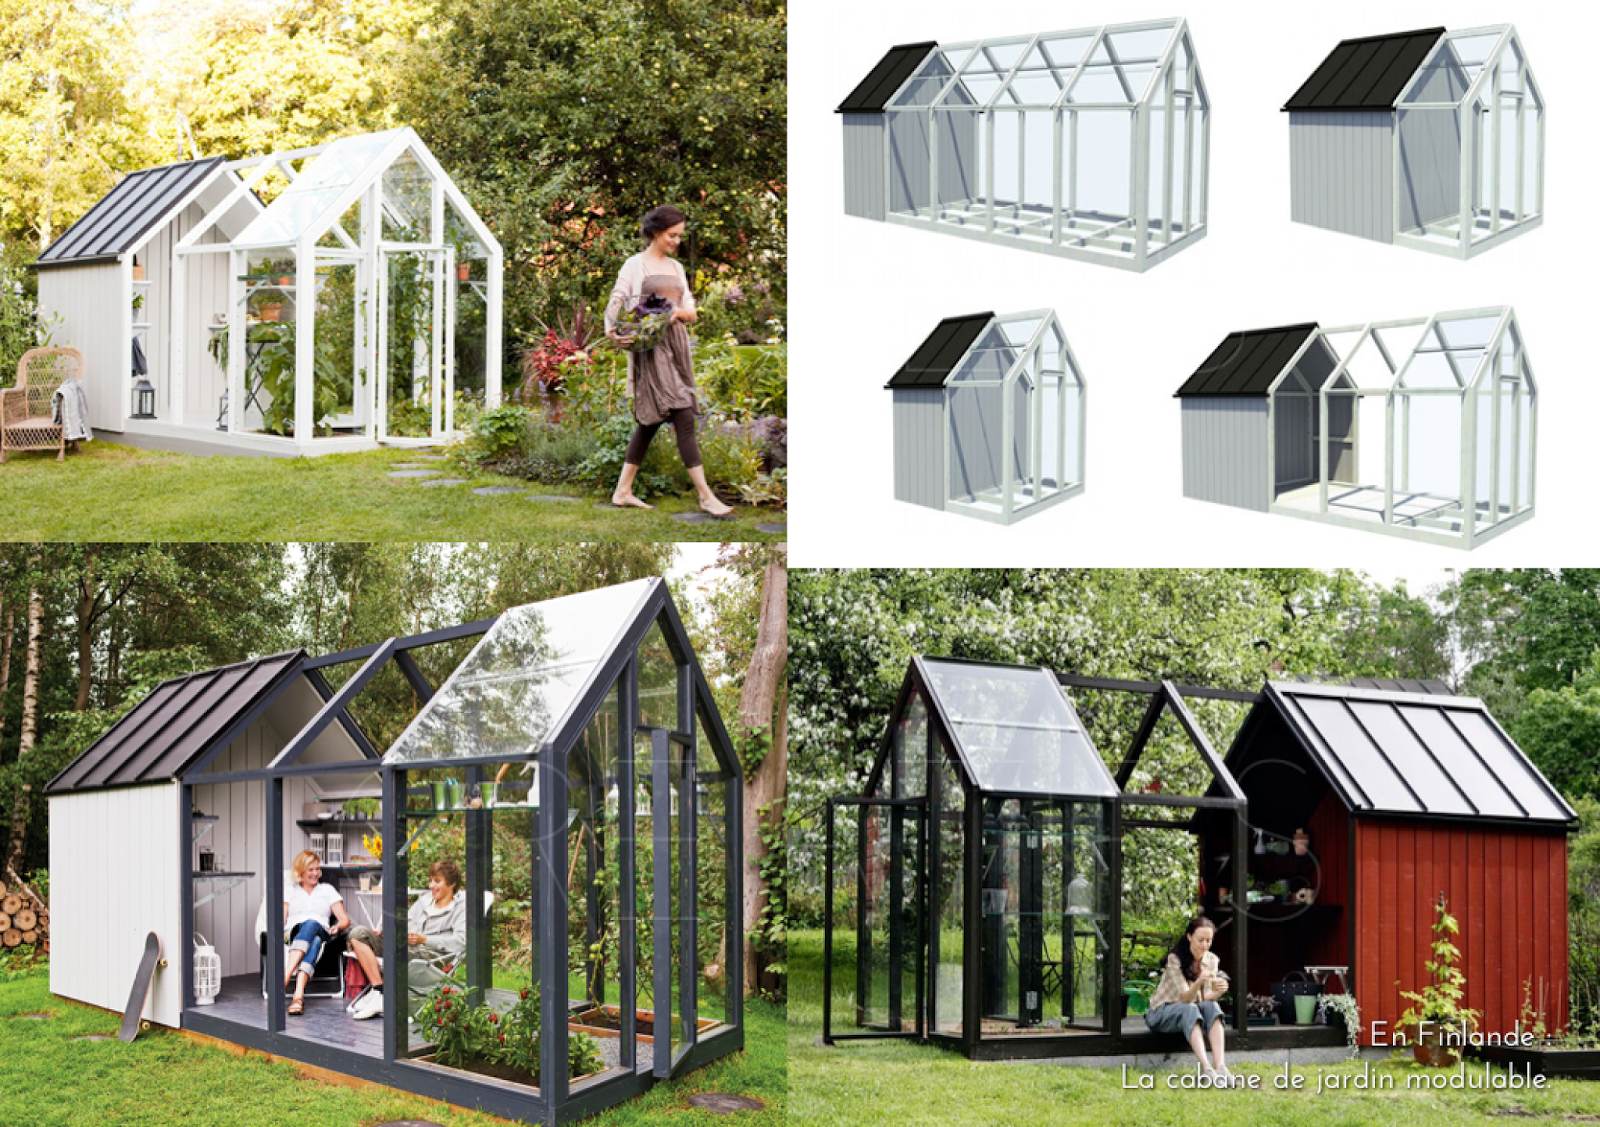 en finlande la cabane de jardin modulable cabane de jardin finlande et modulable. Black Bedroom Furniture Sets. Home Design Ideas